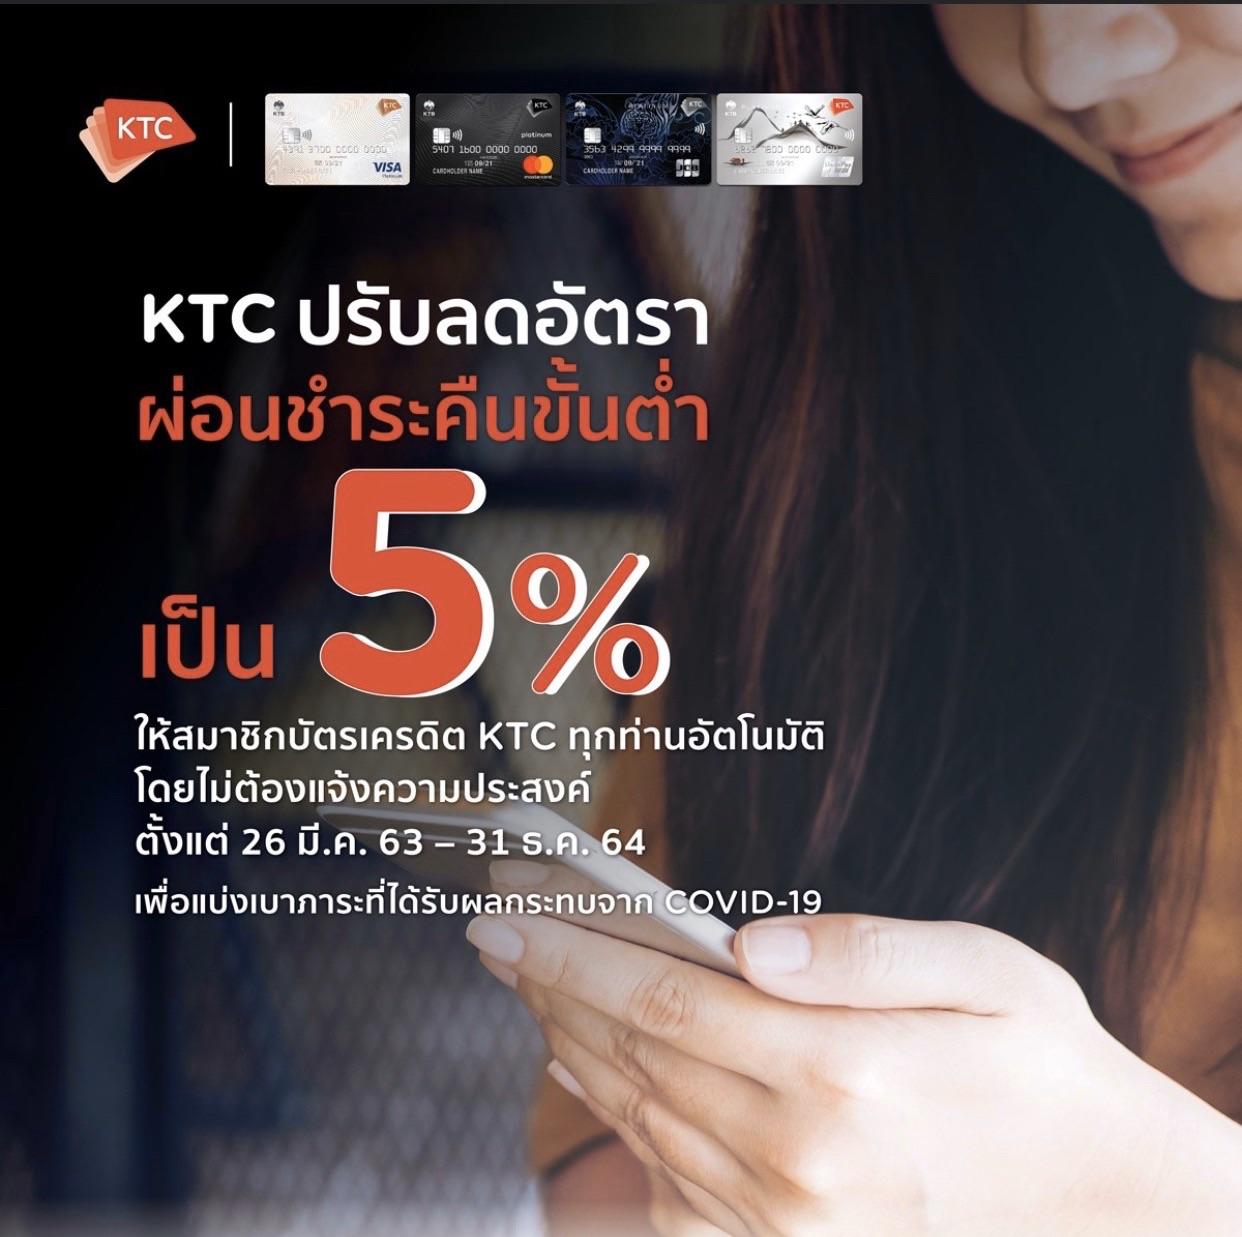 KTC ปรับลดอัตราผ่อนชำระขั้นตํ่าของบัตรเครดิต KTC จาก 10% เป็น 5%